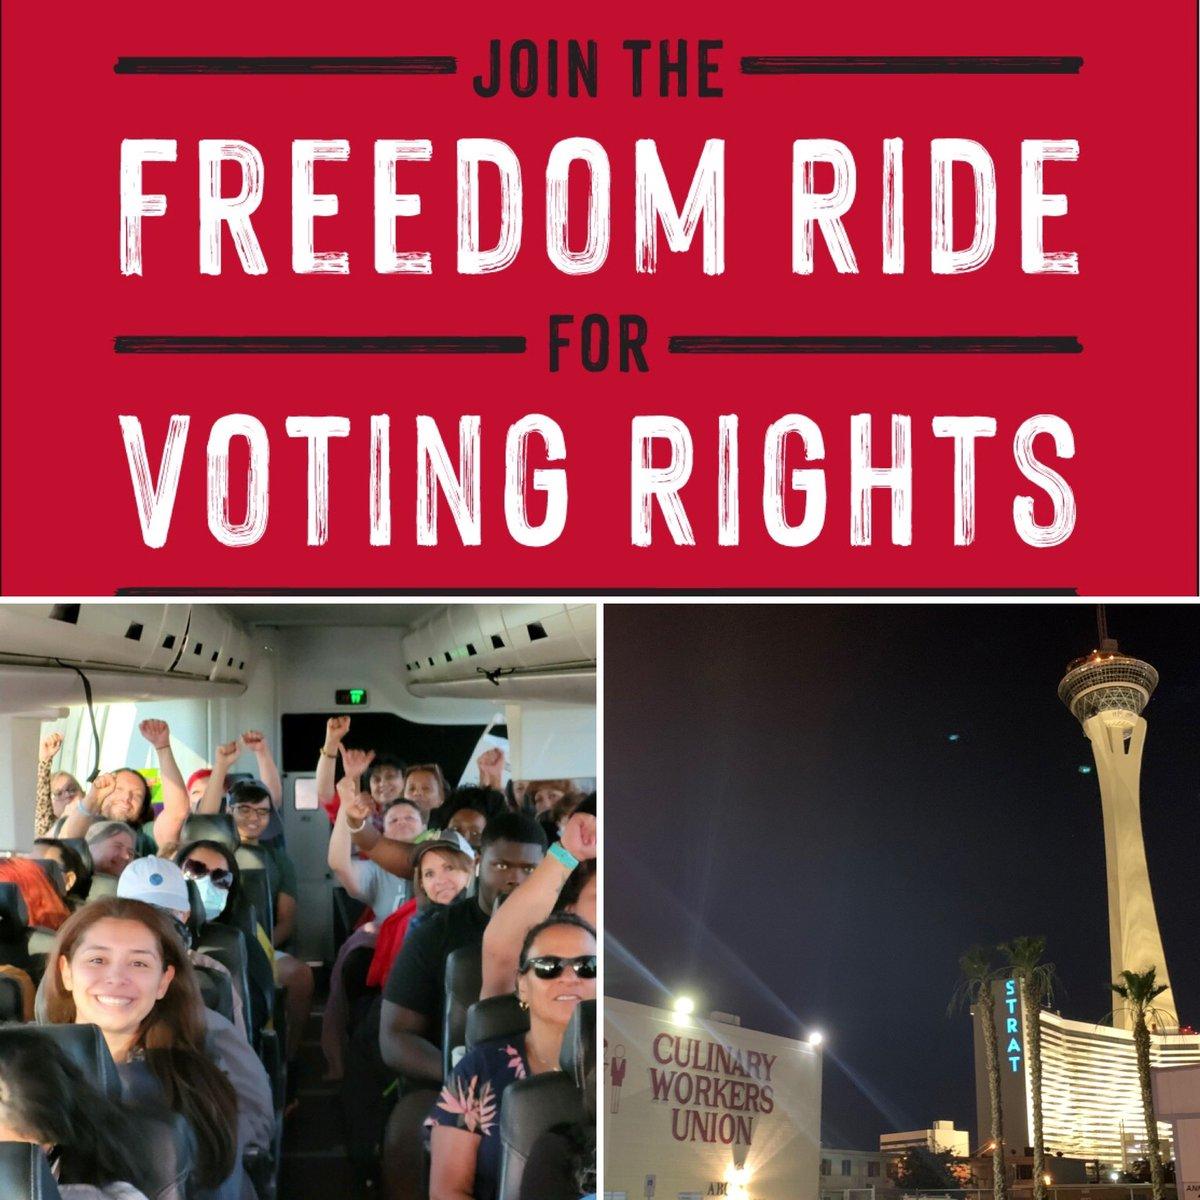 The San Diego #FreedomRide2021 delegation left Vegas at 5 AM and we're Denver-bound!  @bertharodz @GreenNewDealSD @AriCriste